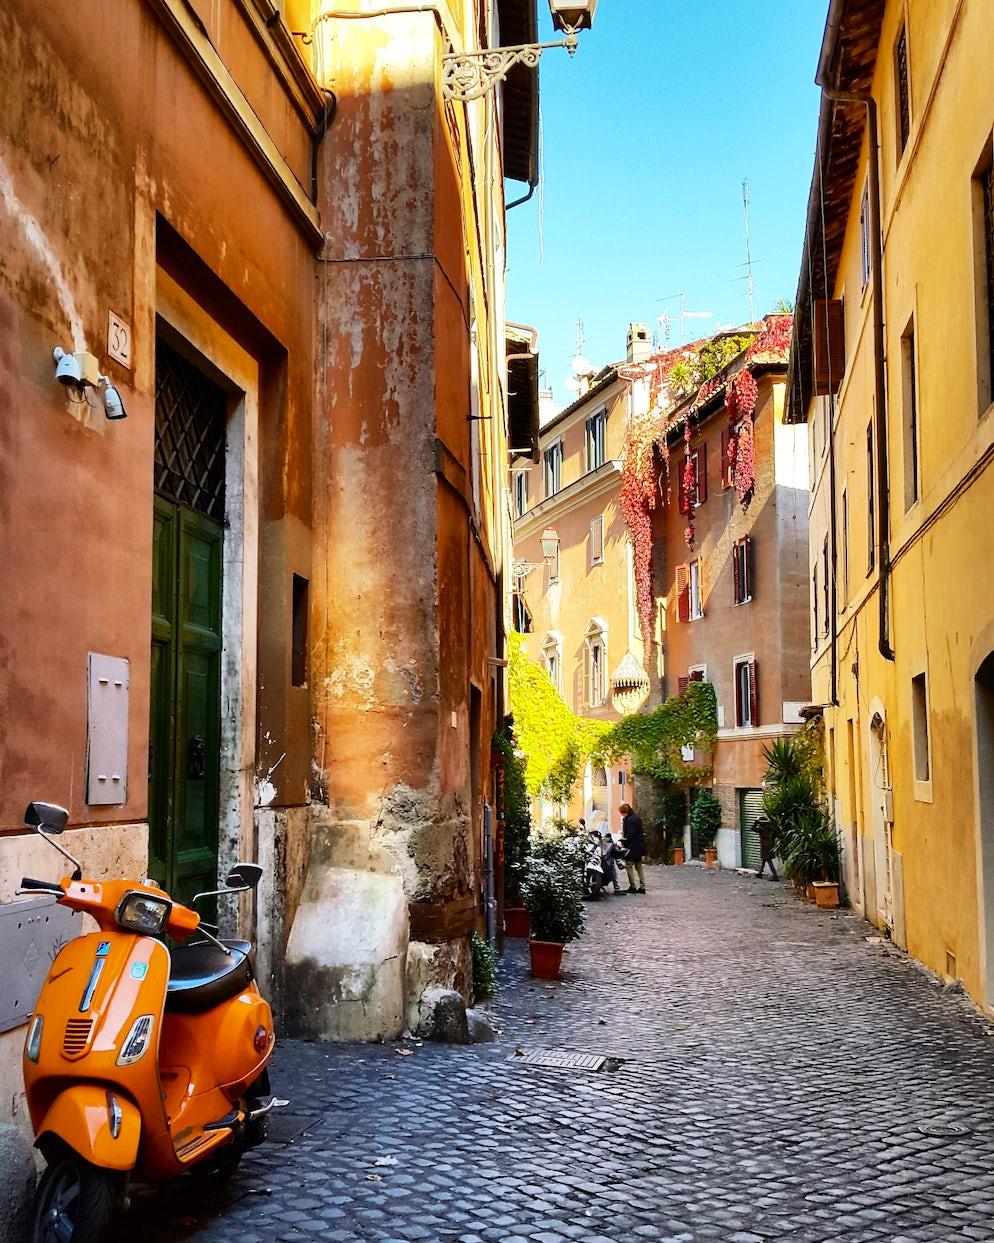 A beautiful corner, Trastevere. Photo © Vy Dan Tran.